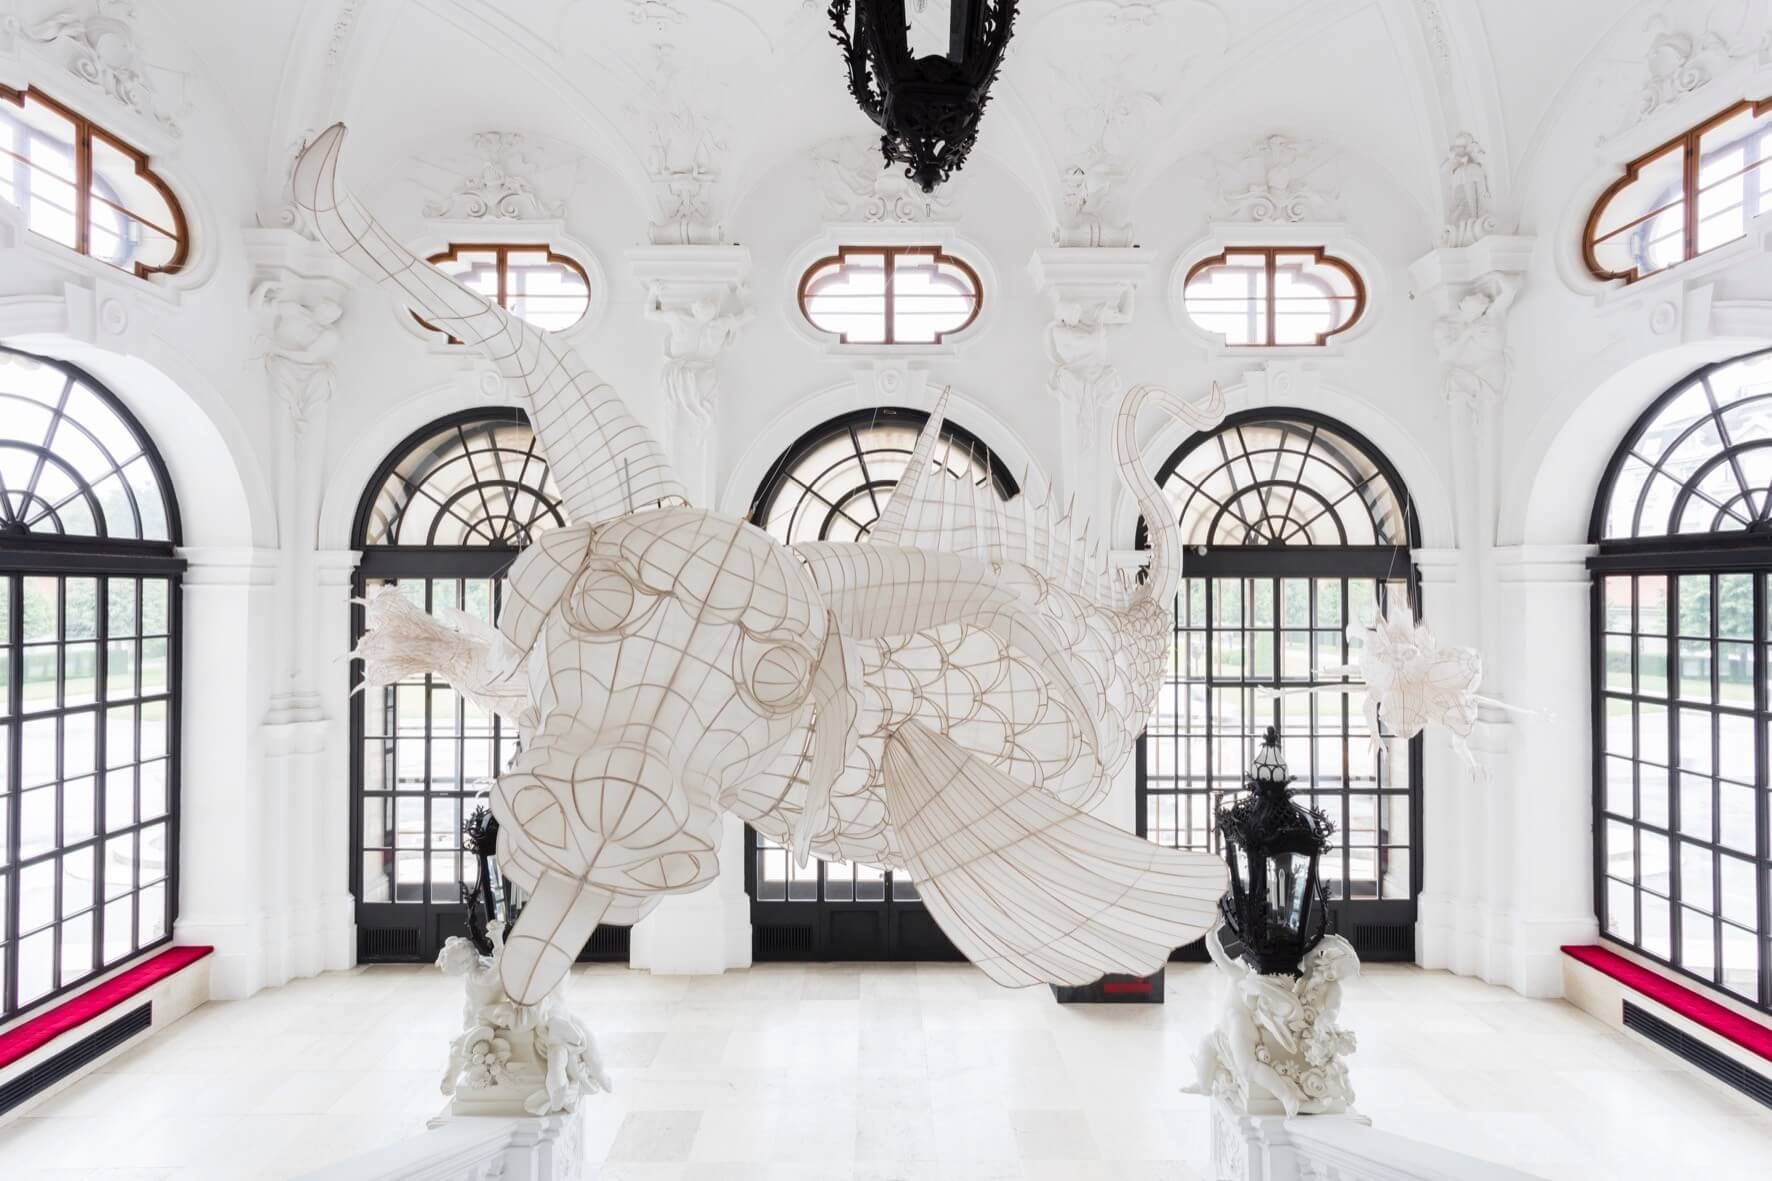 Ai Weiwei, Lu 鯥, 2015 © Belvedere, Wien 470 x 250 x 195 cm Bambus und Seide